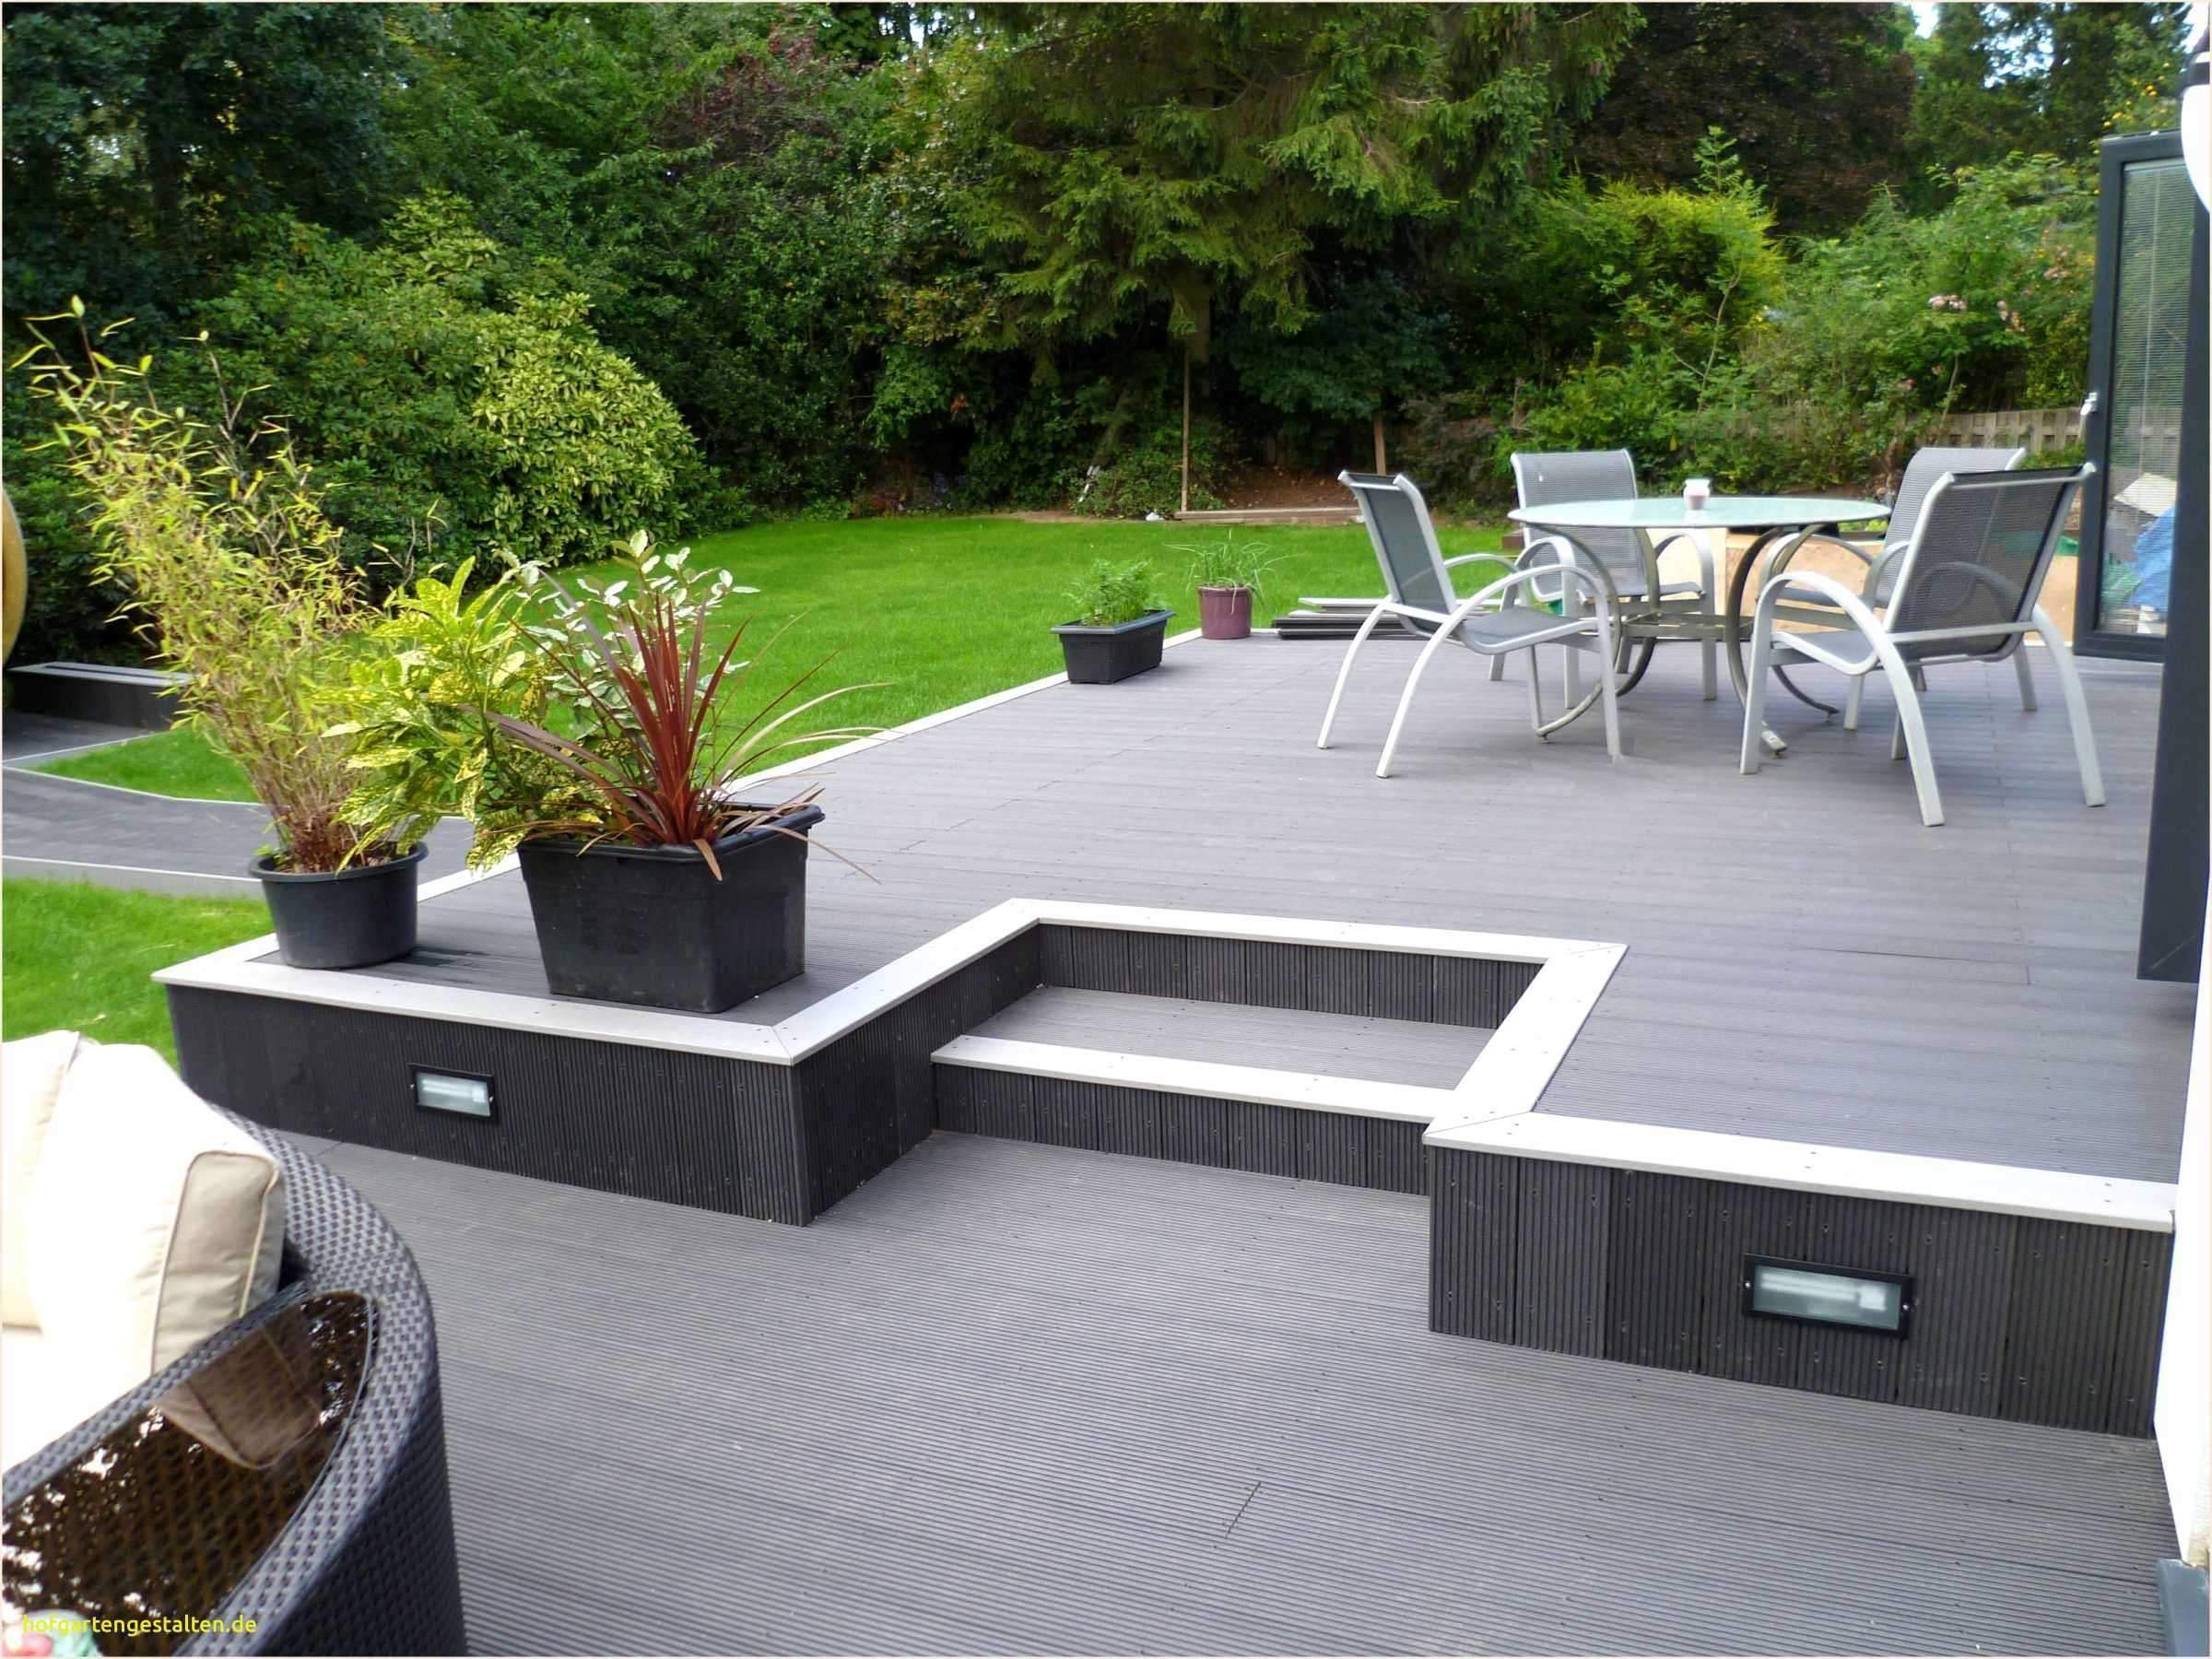 garten terrasse holz luxus 31 genial schaukelstuhl garten das beste von of garten terrasse holz